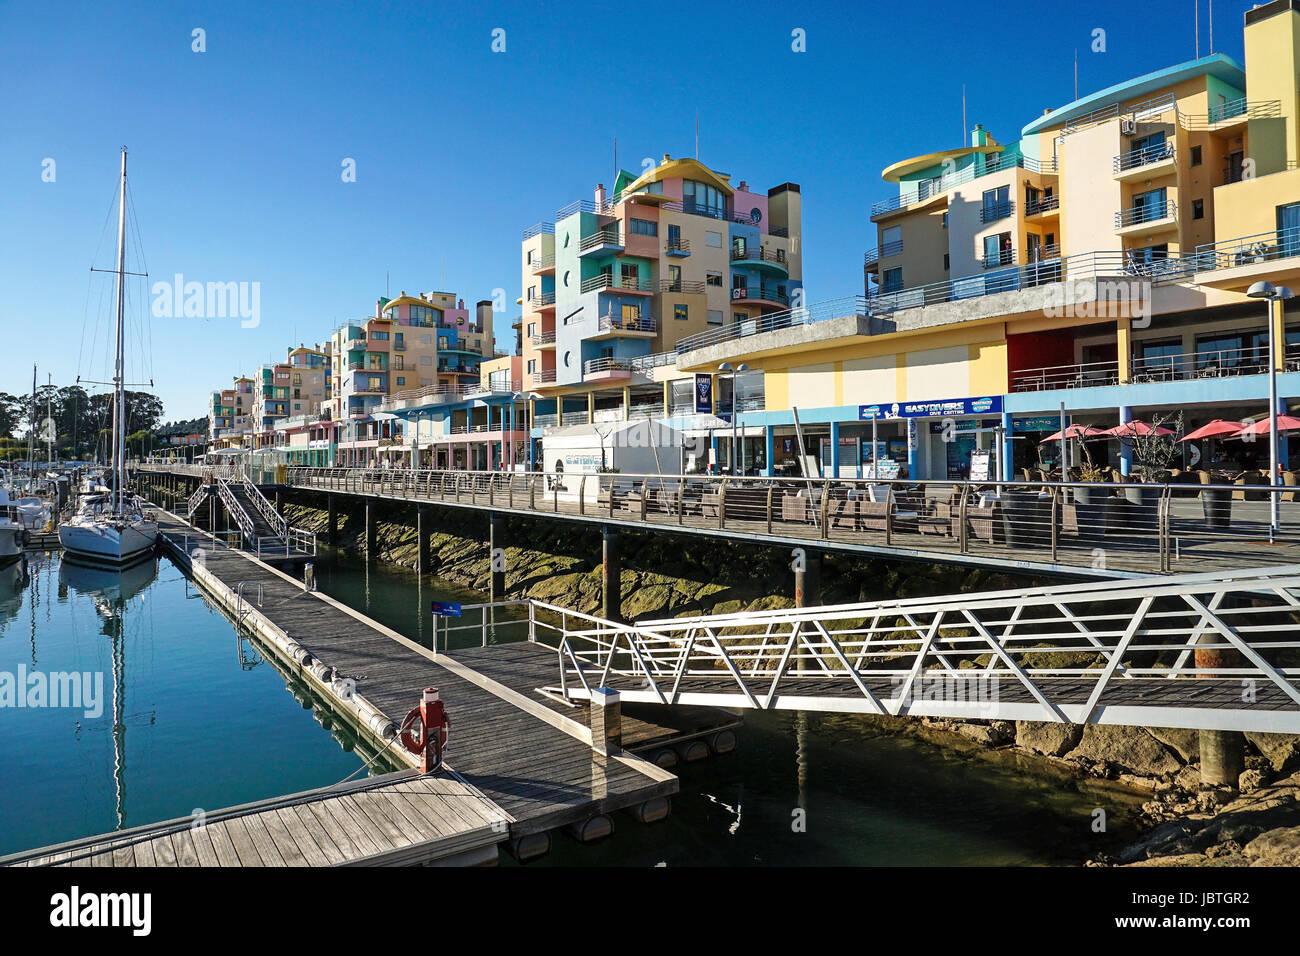 Europa, Portugal, Algarve, Albufeira, Marina, yacht-Hafen, Häuser ...